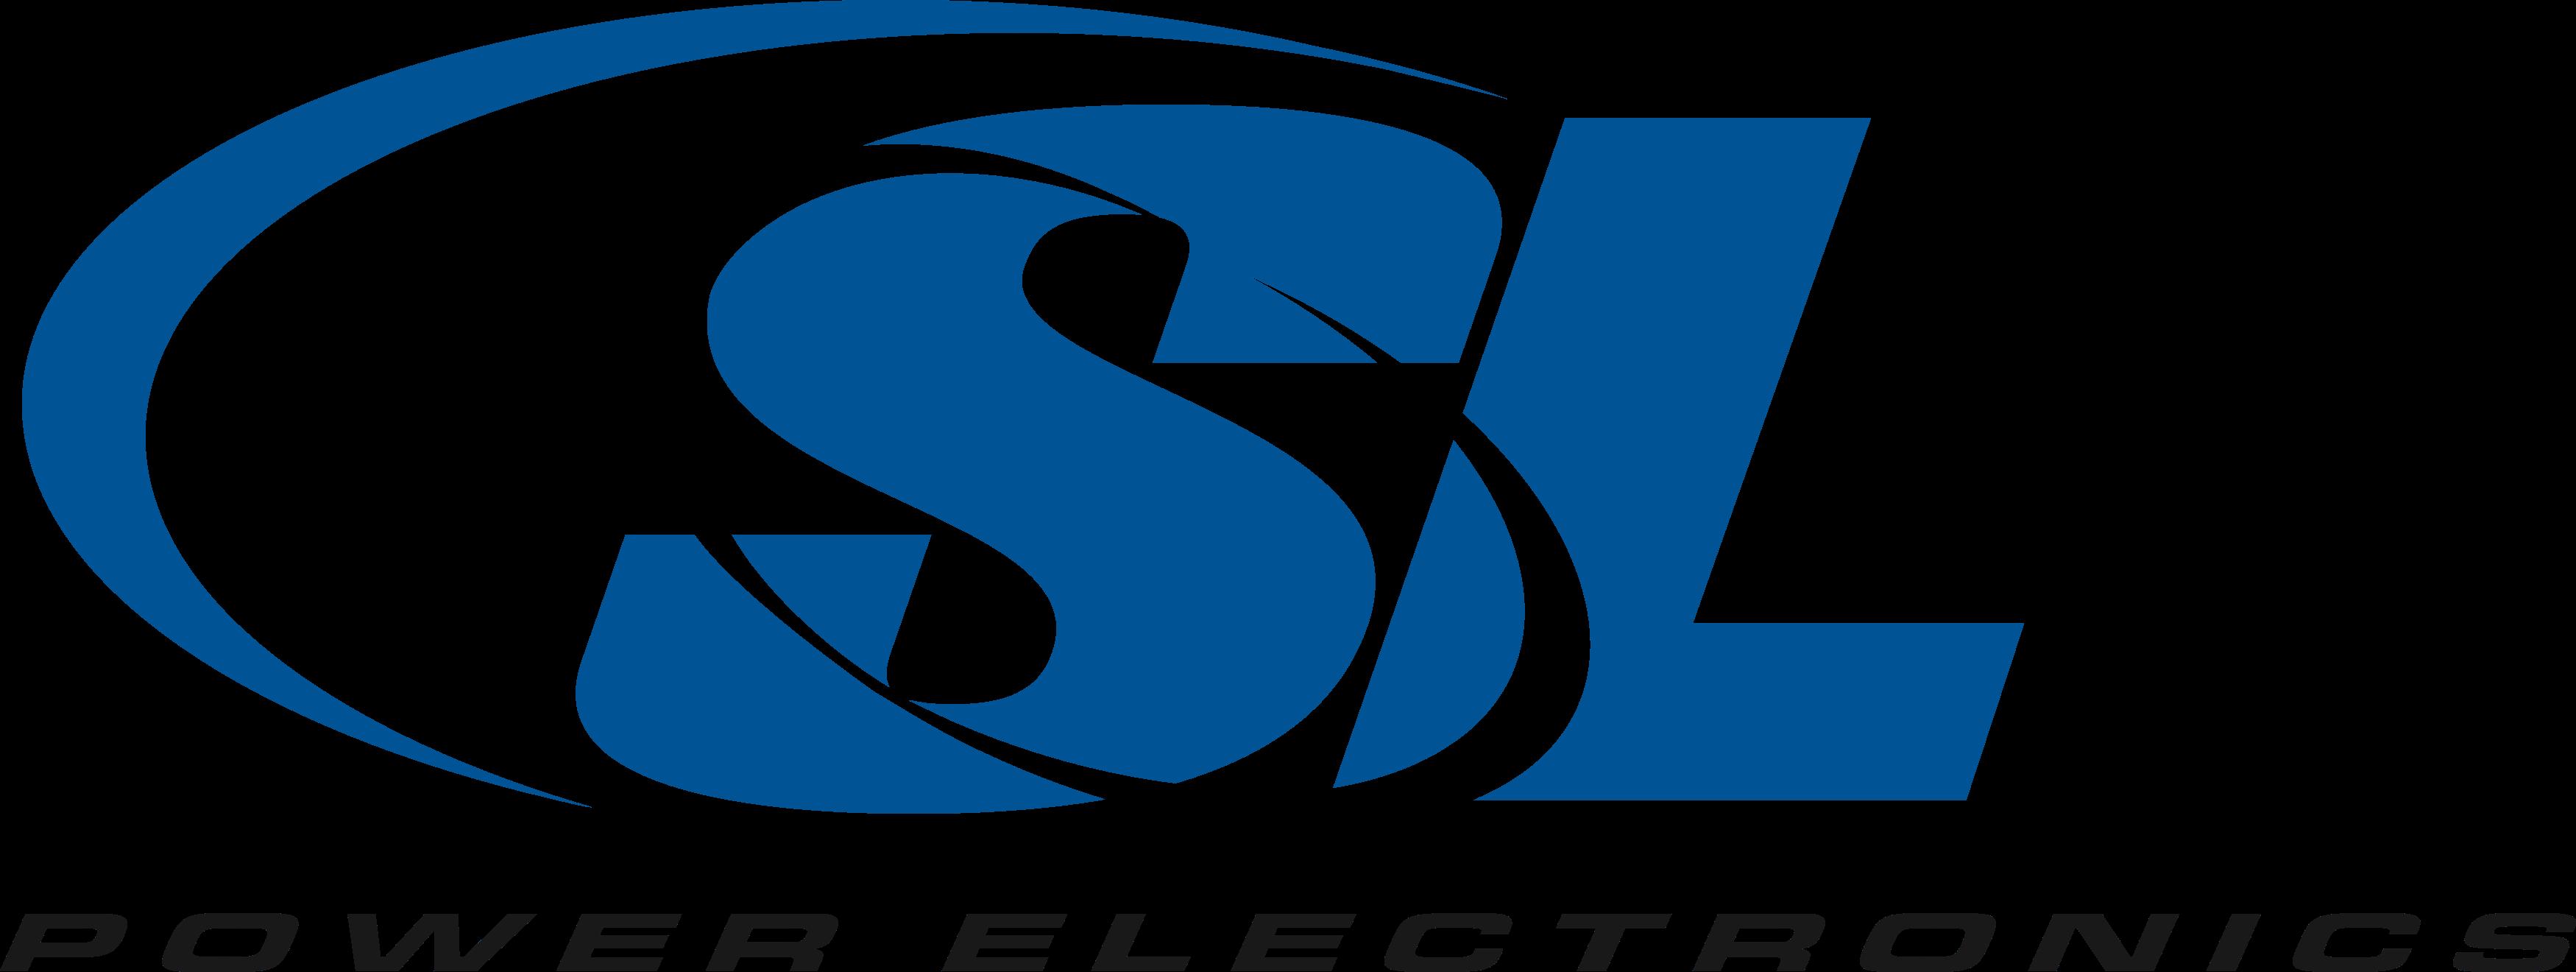 SL-Power-Power-Supplies-Design-Logo